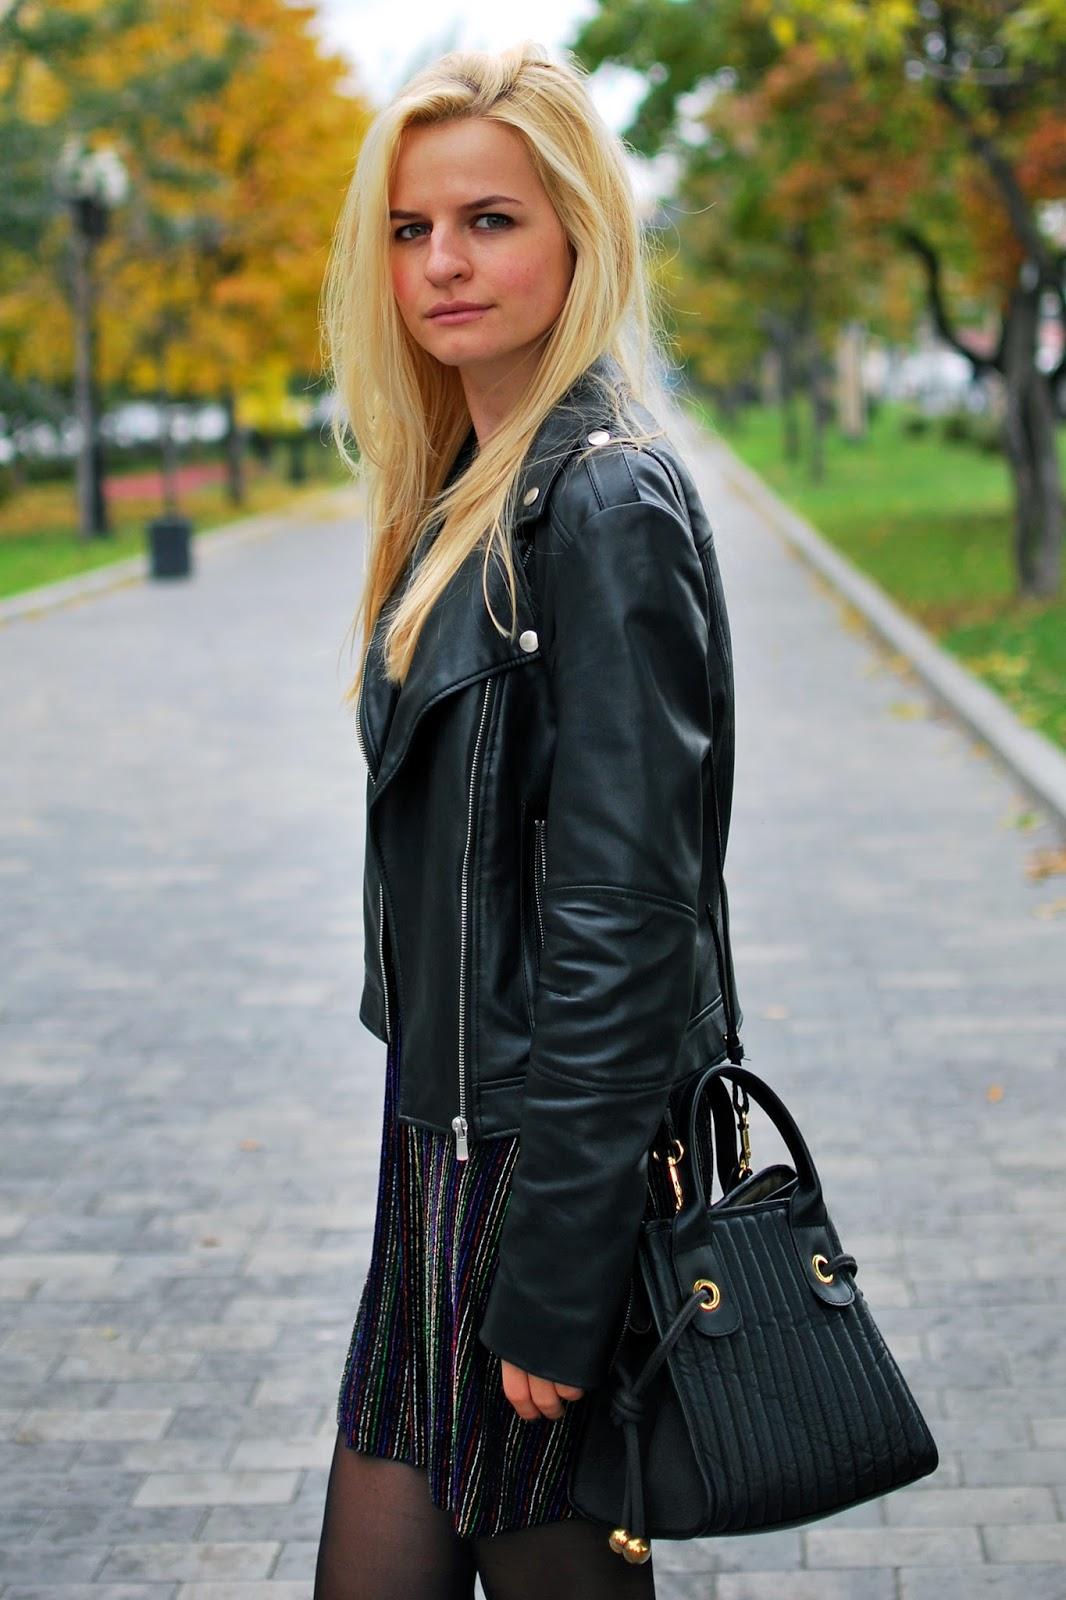 biker jacket outfit, blog de moda, costa de la moda, costadelamoda, fashion blog outfit, autumn street style